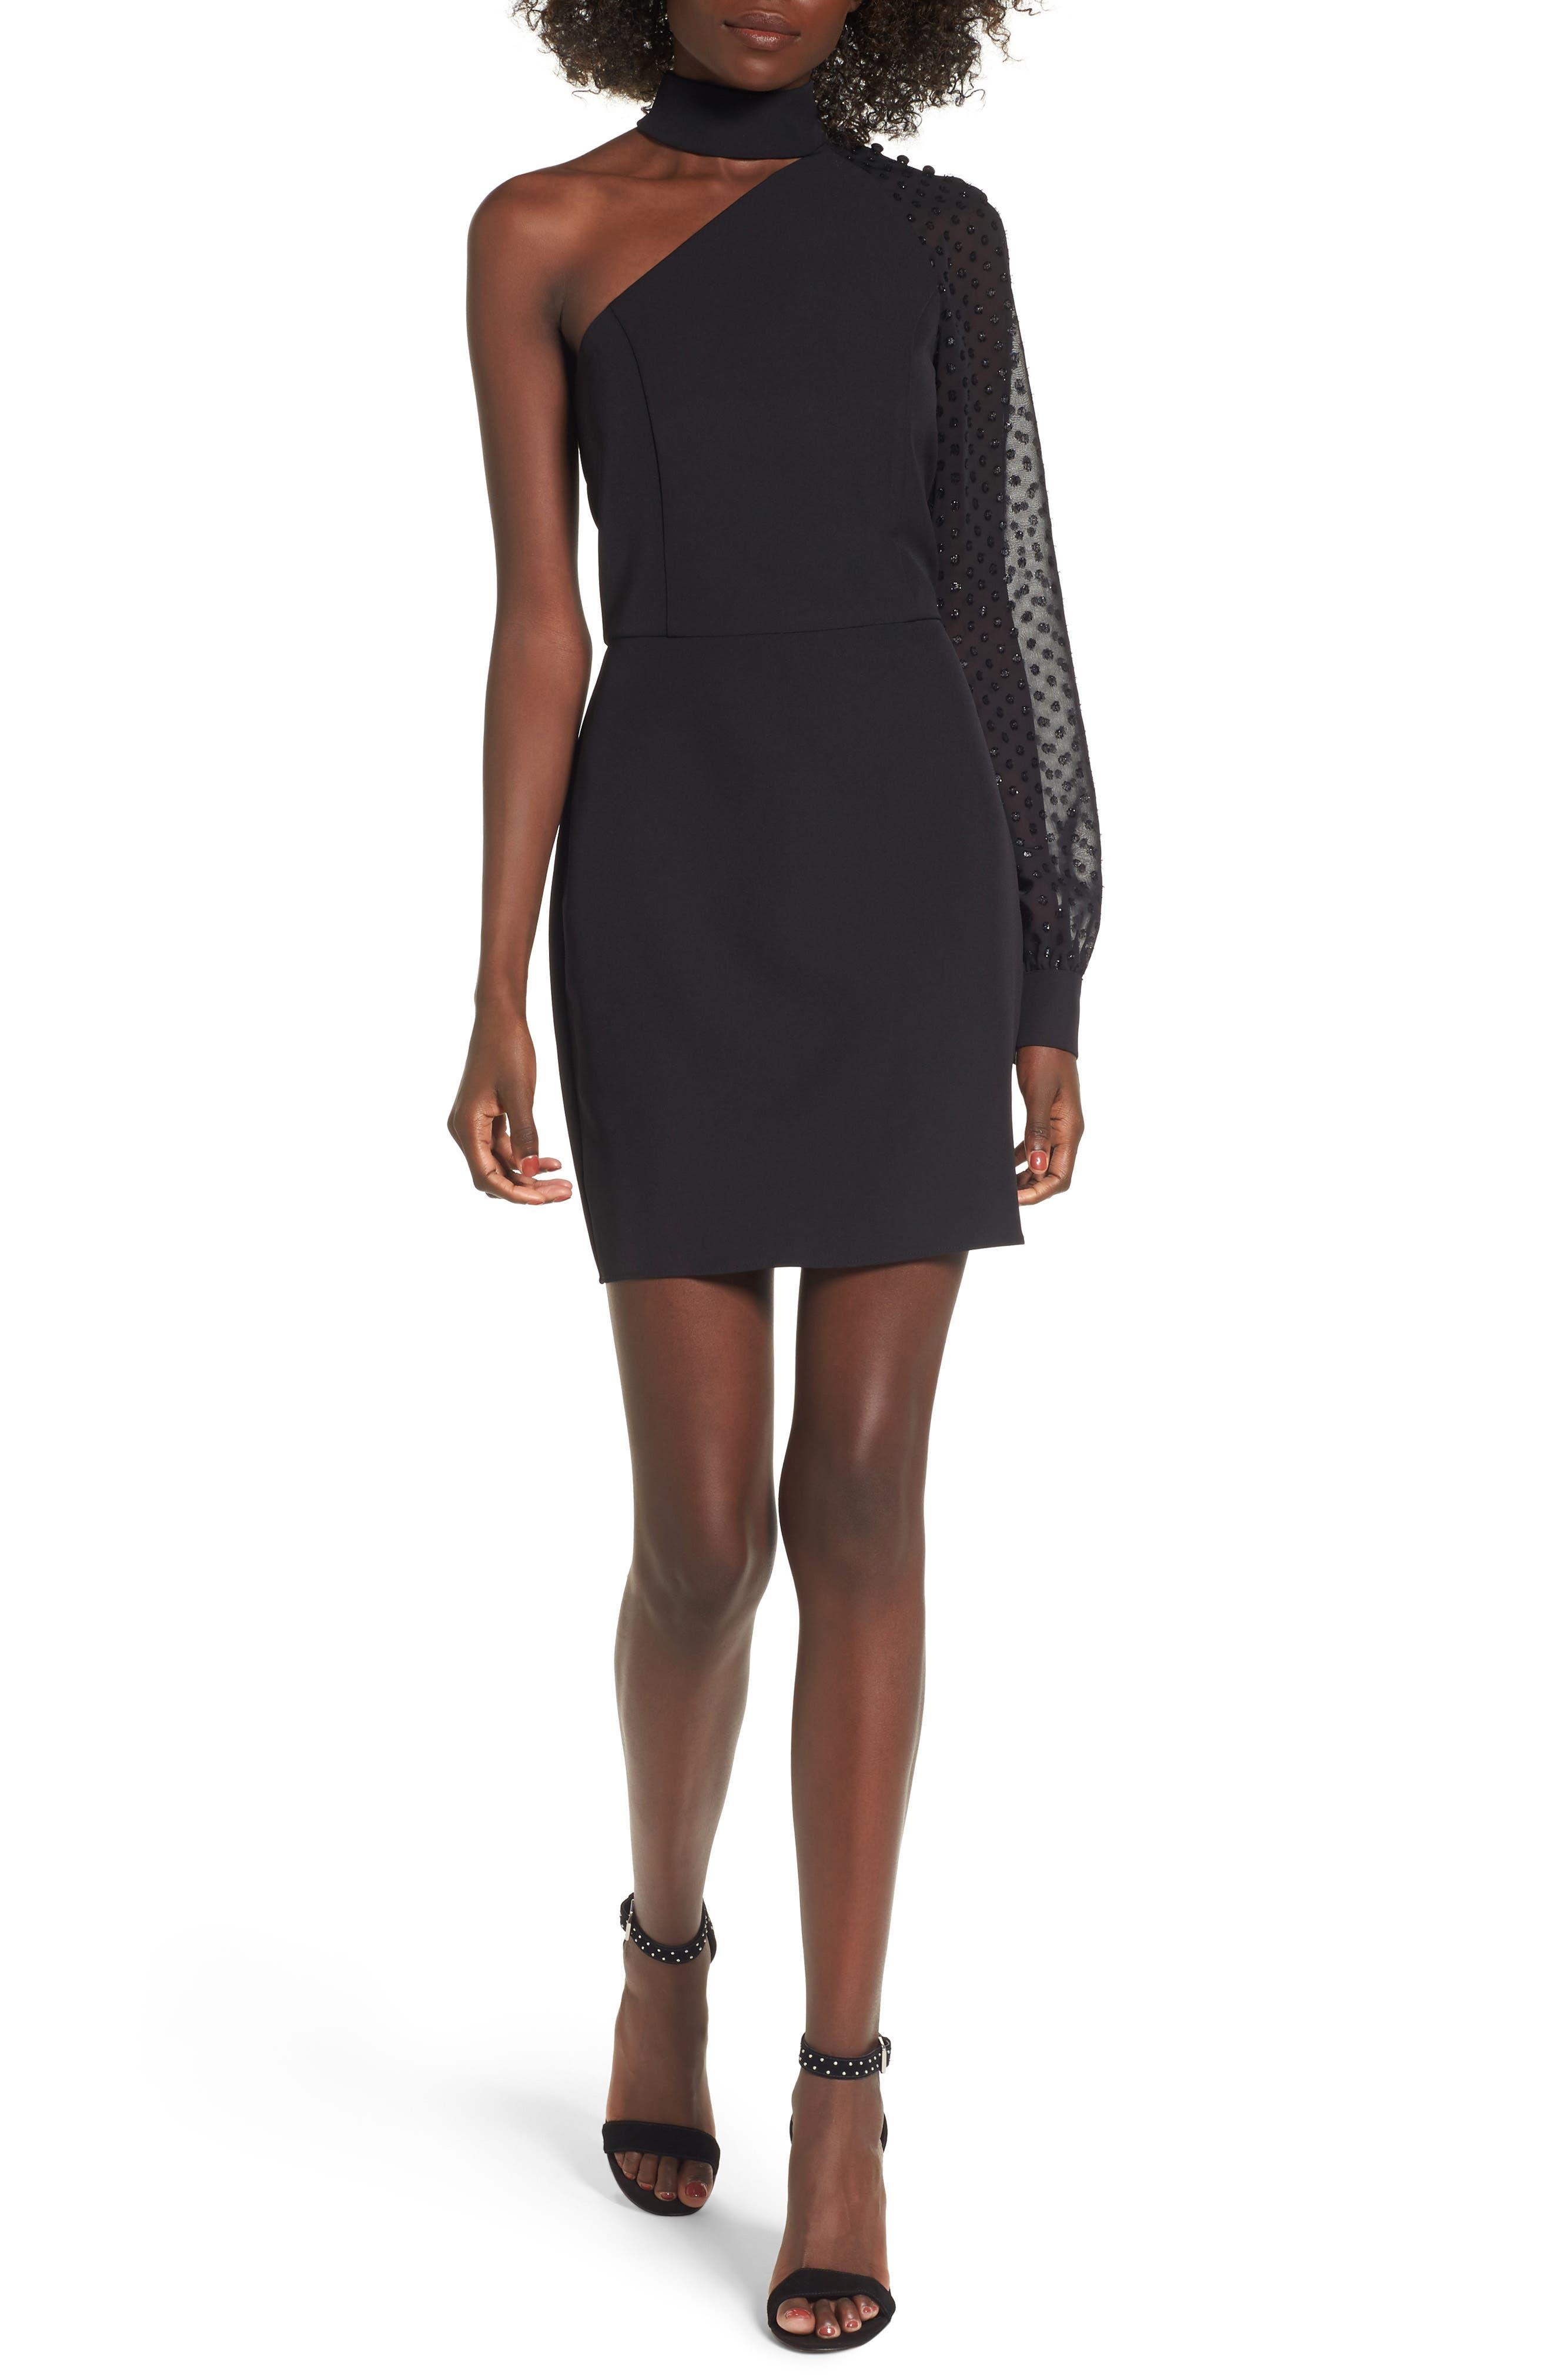 DEVLIN Layne One-Shoulder Dress